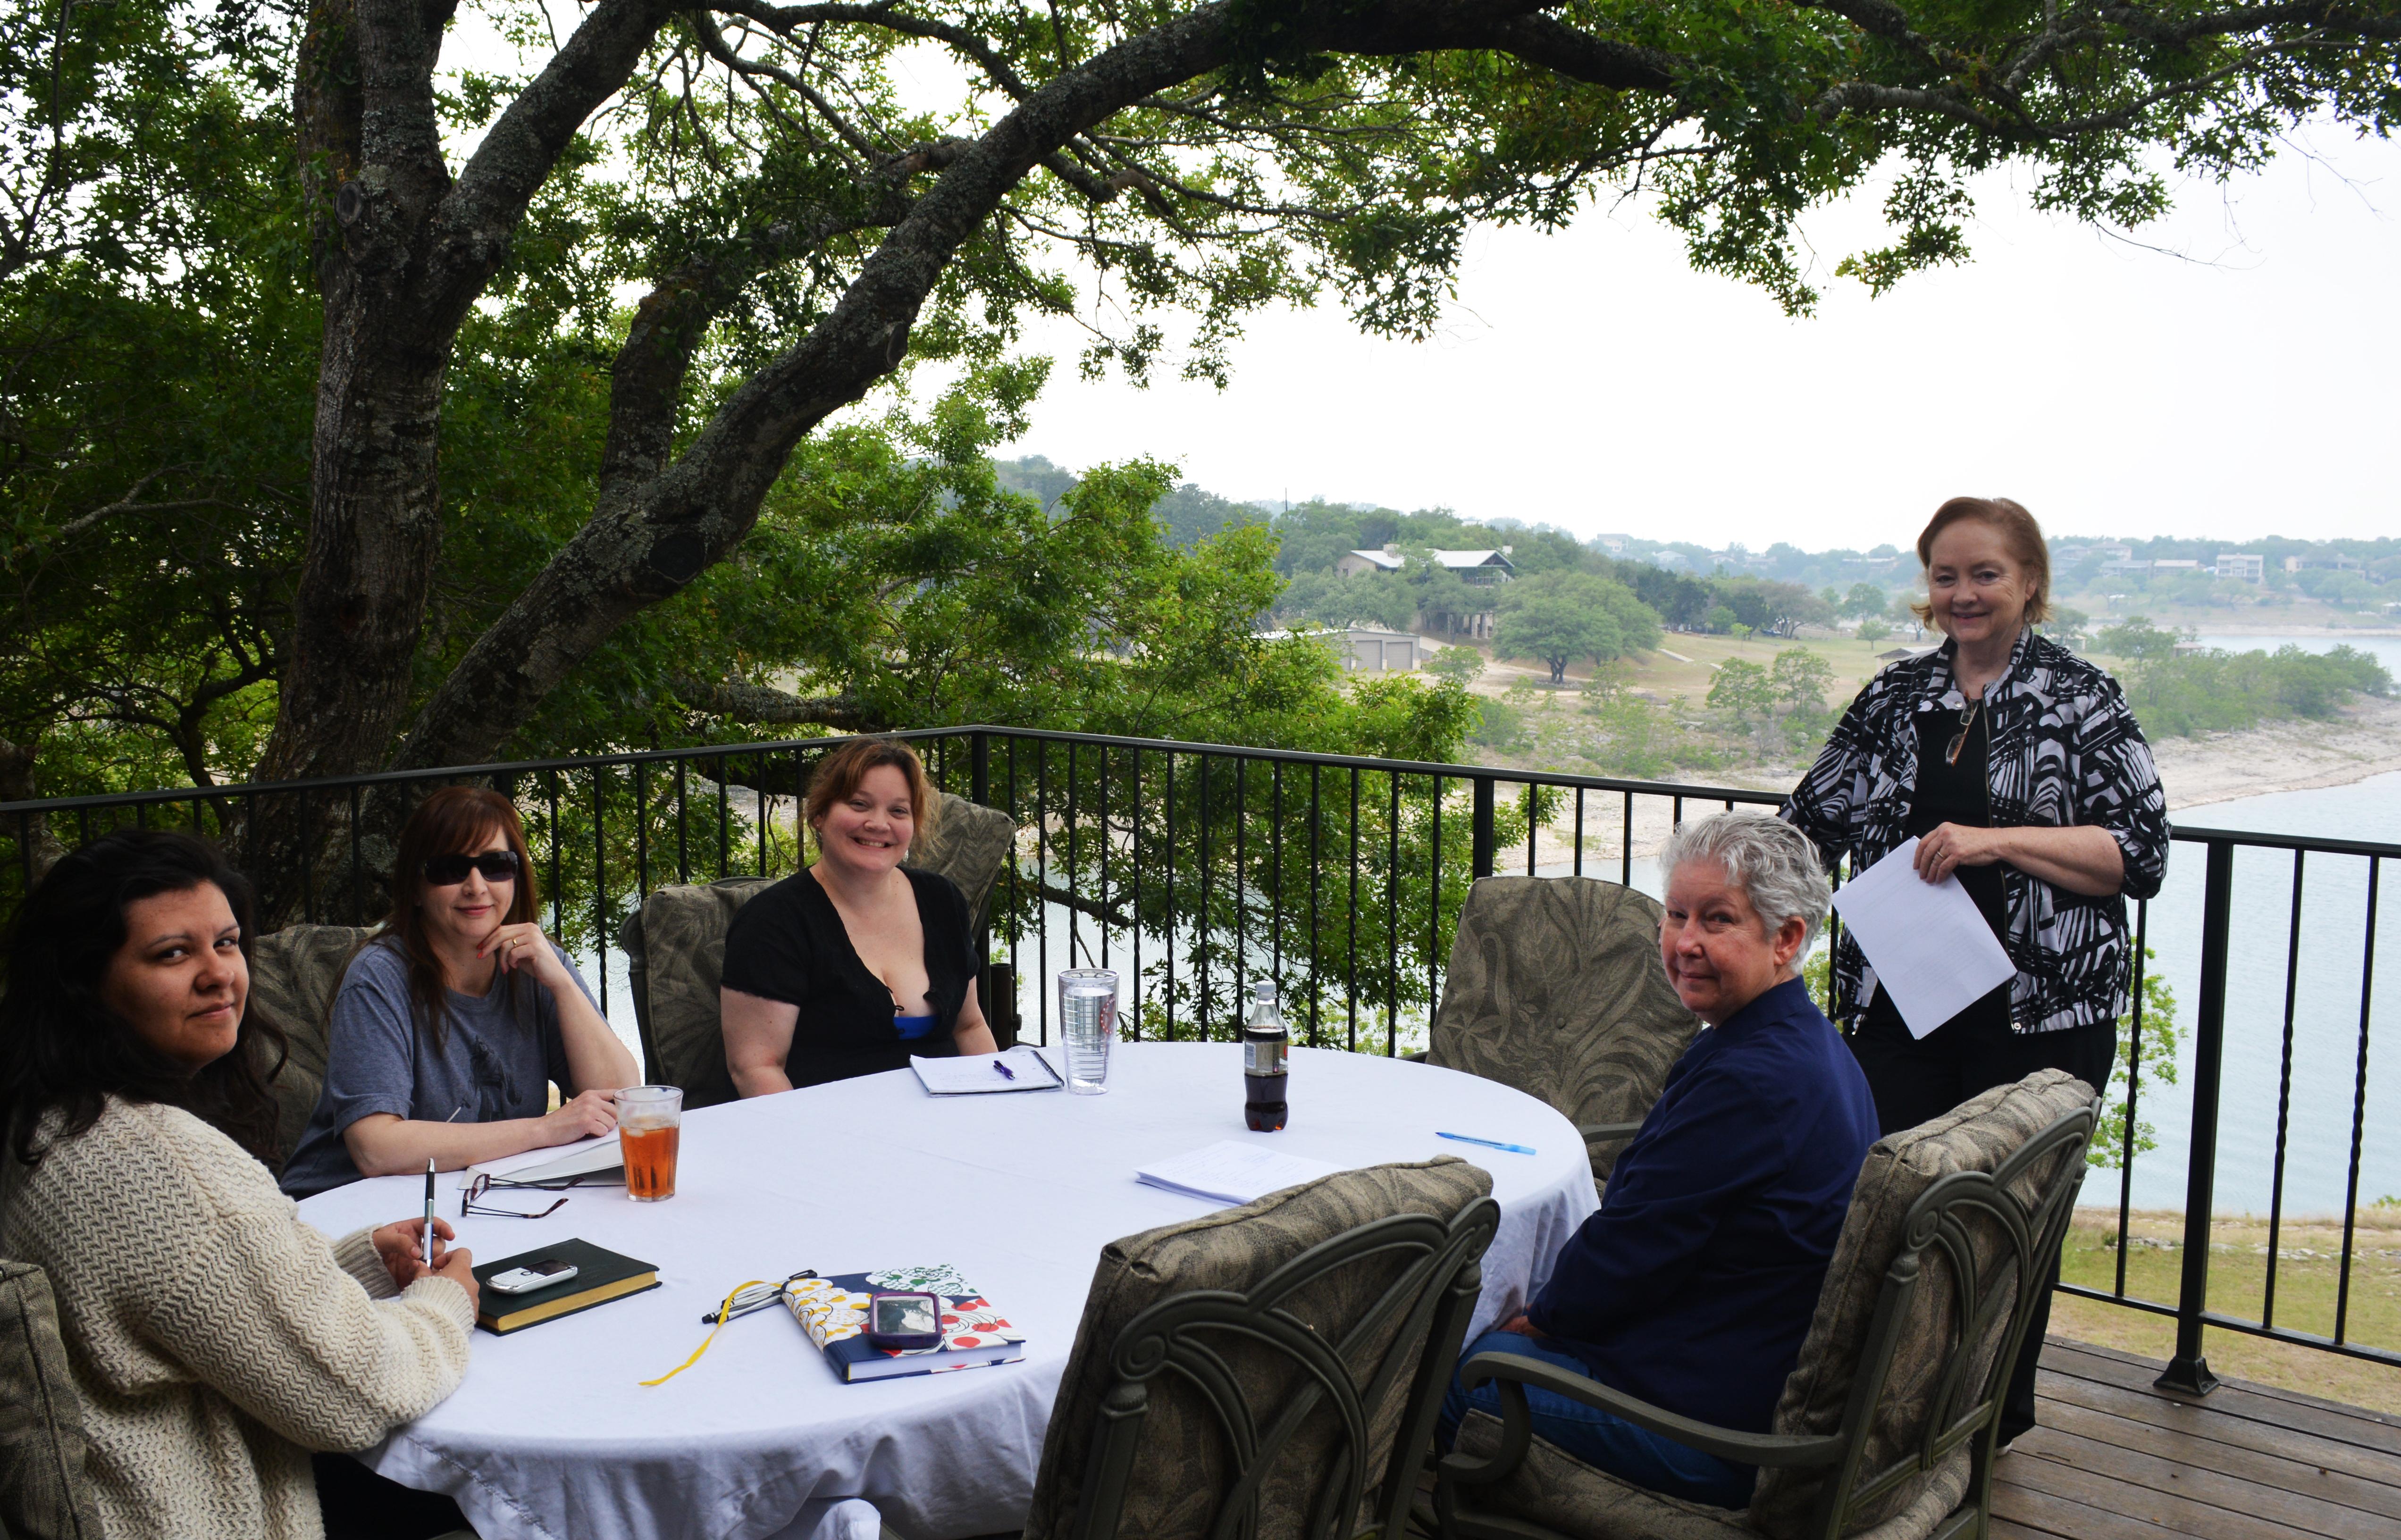 Talking story with Storm Navarro, Joni Hahn, Sasha Summers, Jodi Thomas, and Marilyn Tucker